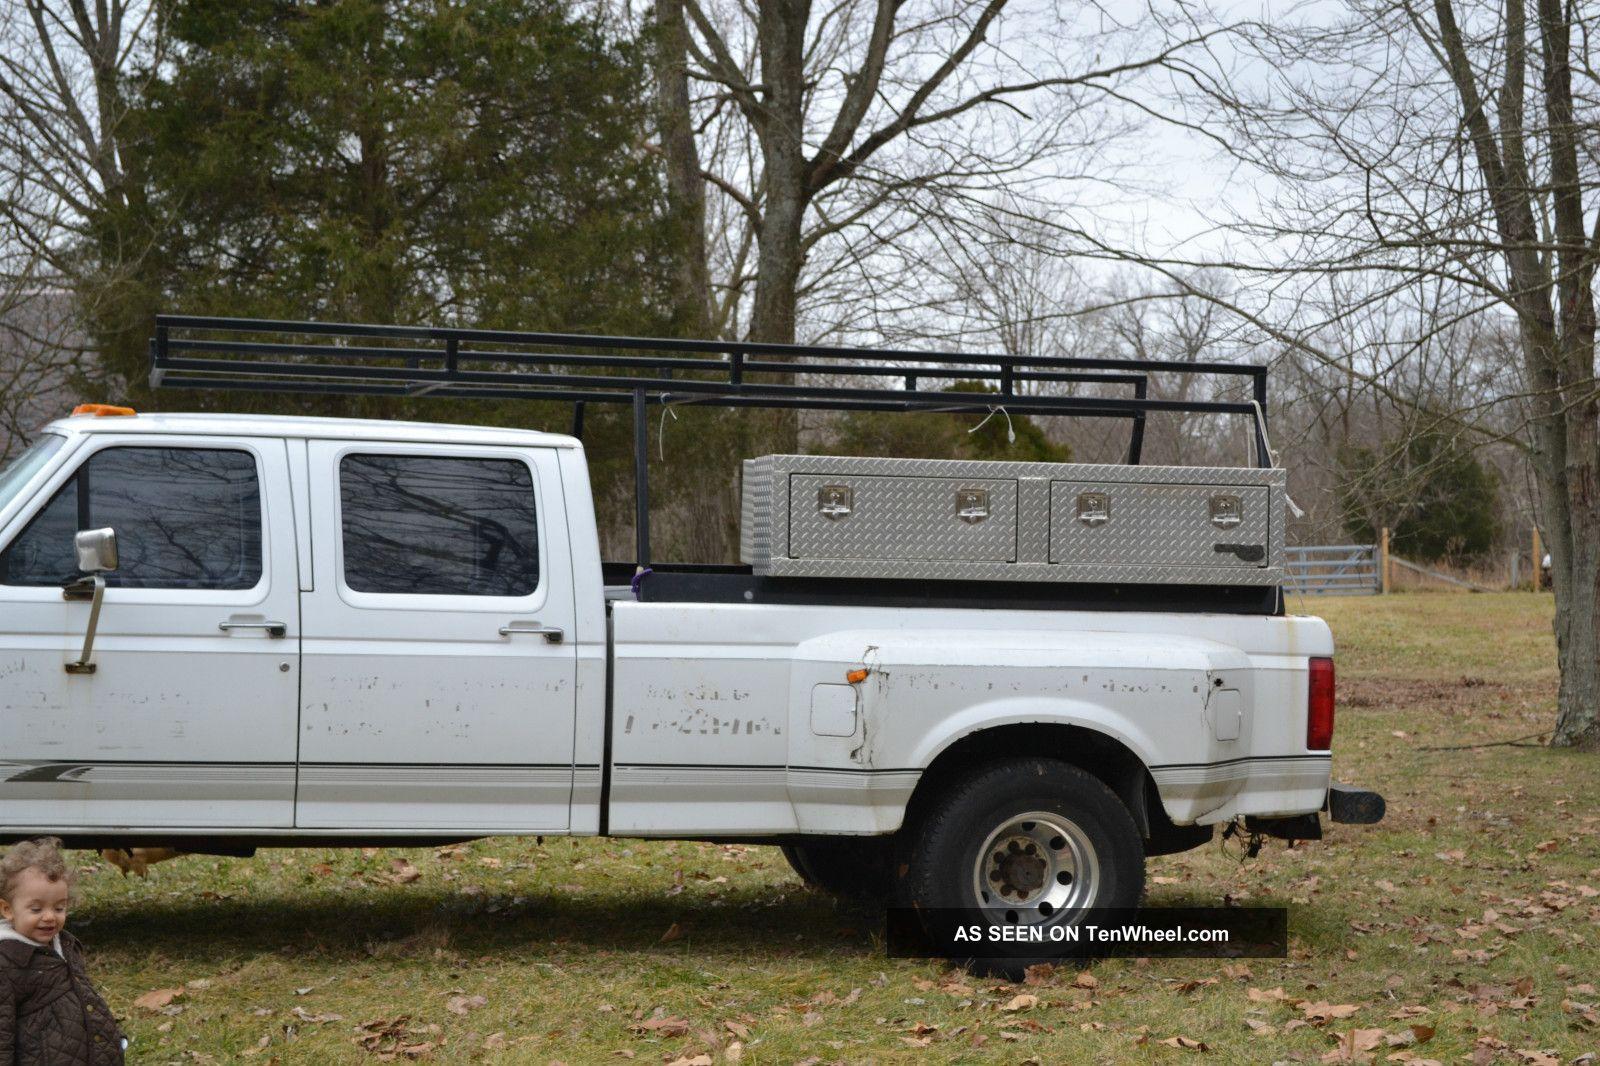 1997 ford f 350 dually xlt cab 7 3l diesel truck. Black Bedroom Furniture Sets. Home Design Ideas